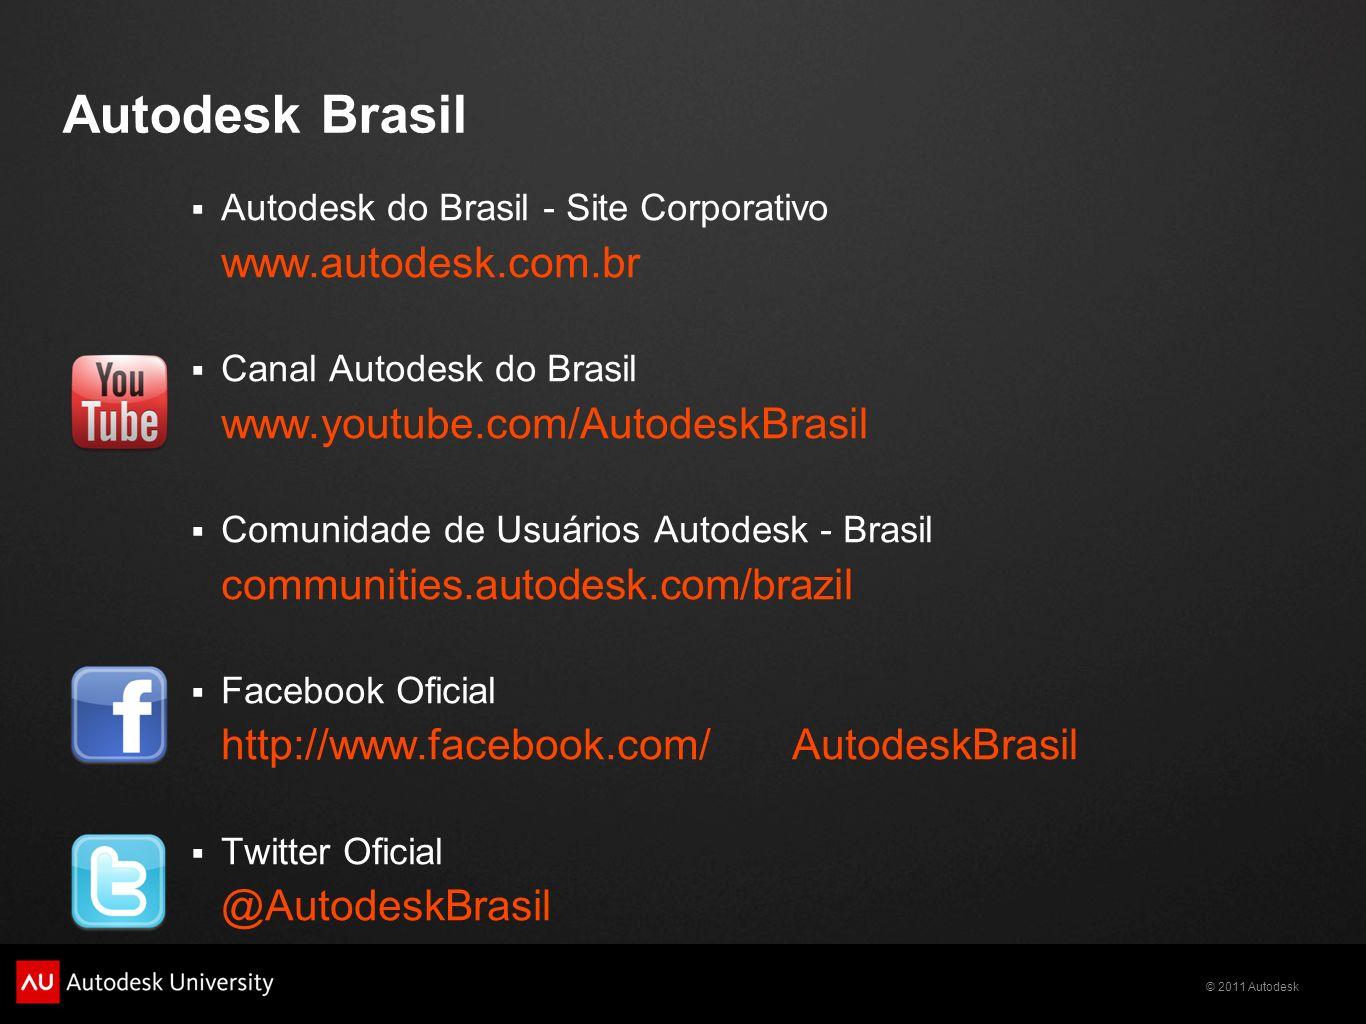 Autodesk Brasil www.autodesk.com.br www.youtube.com/AutodeskBrasil